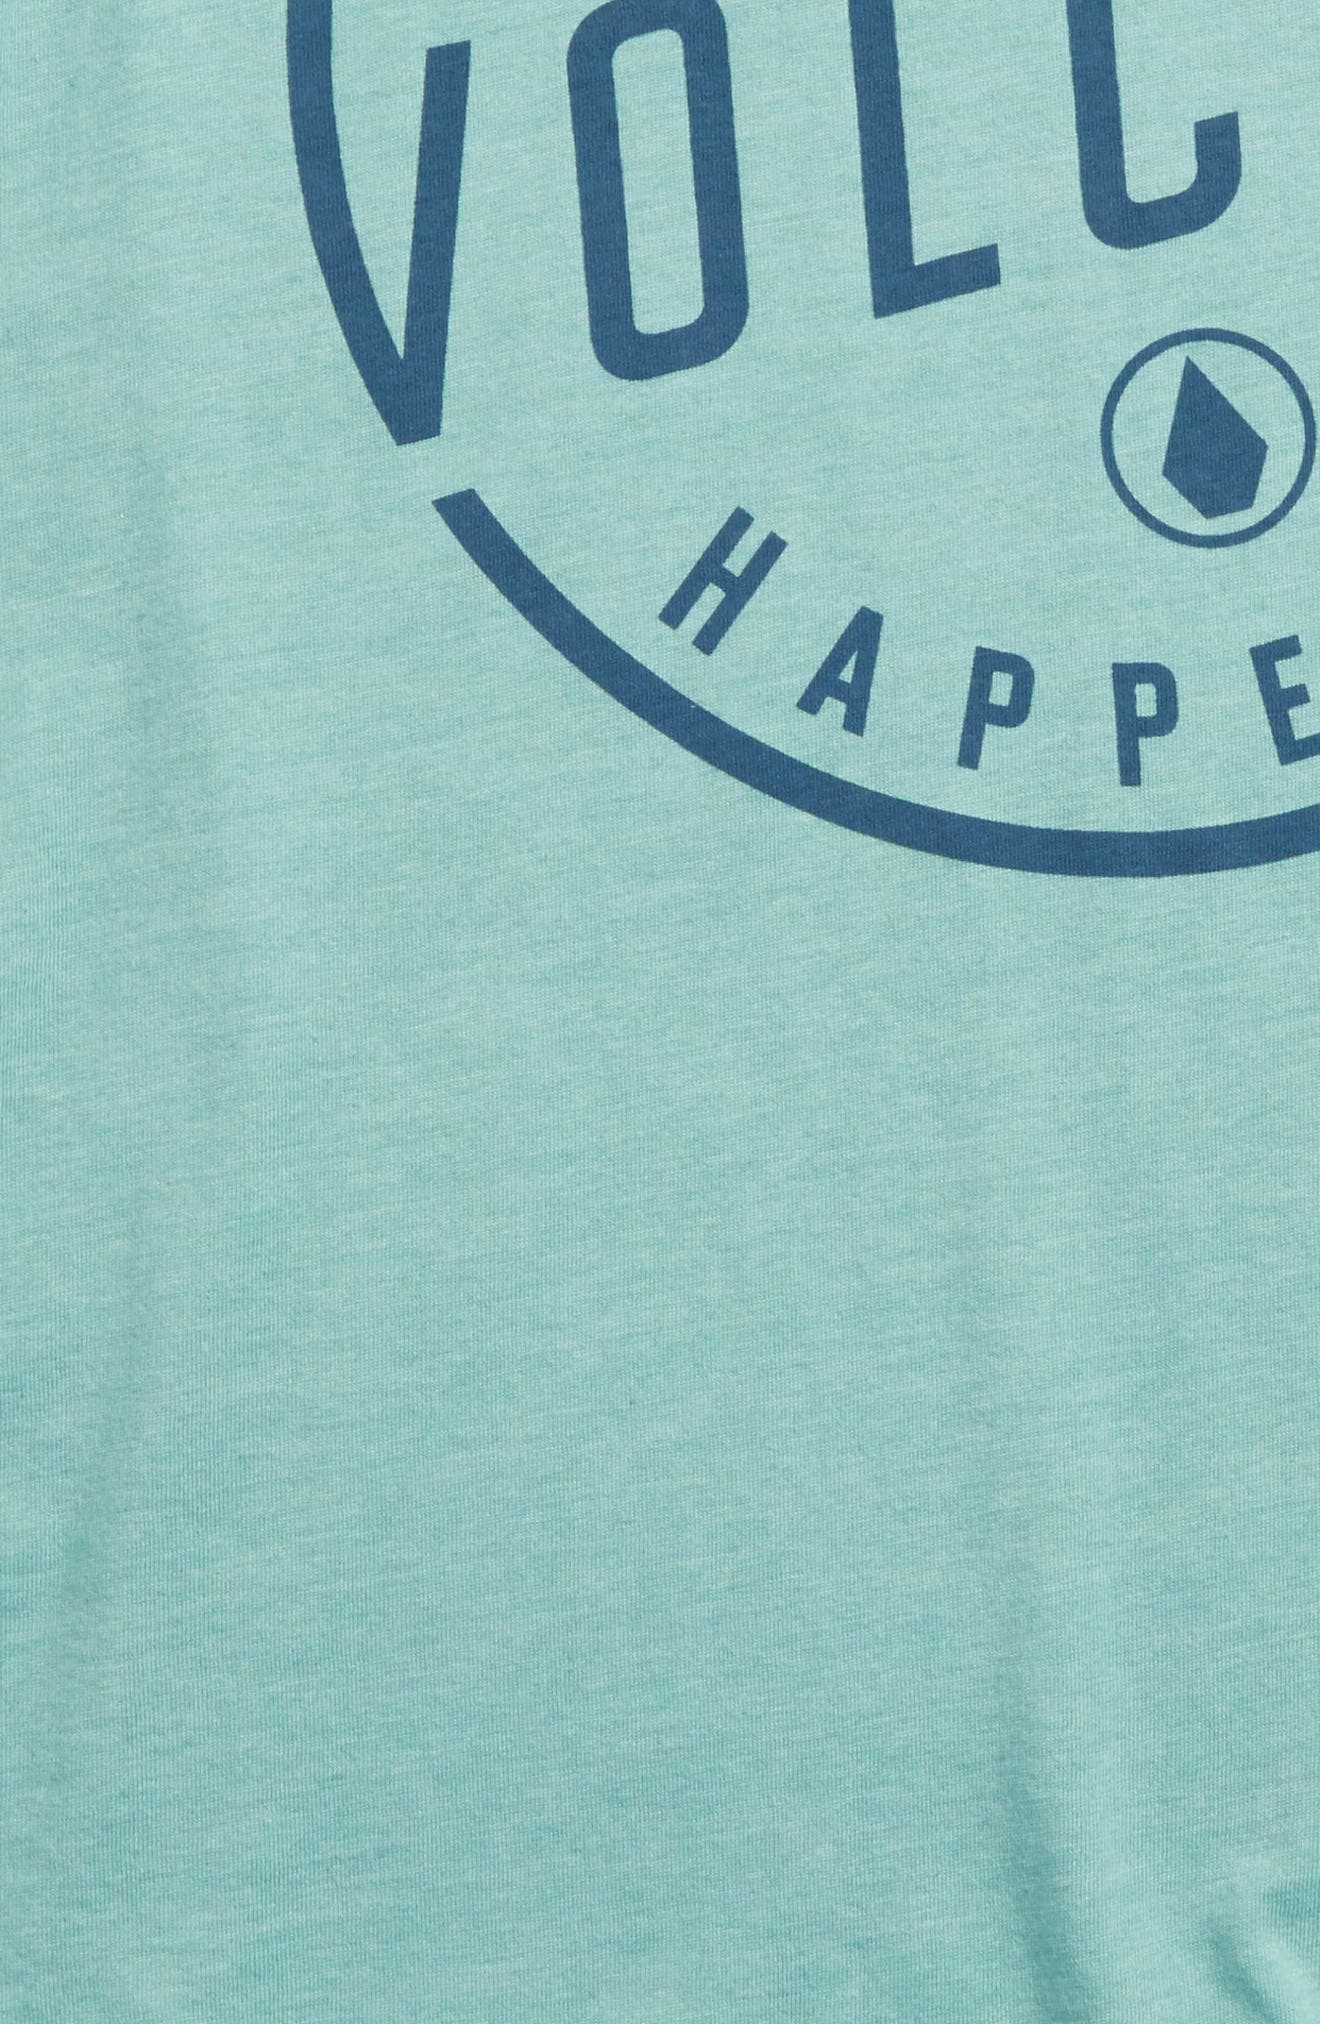 Alternate Image 2  - Volcom On Lock Graphic T-Shirt (Toddler Boys, Little Boys & Big Boys)